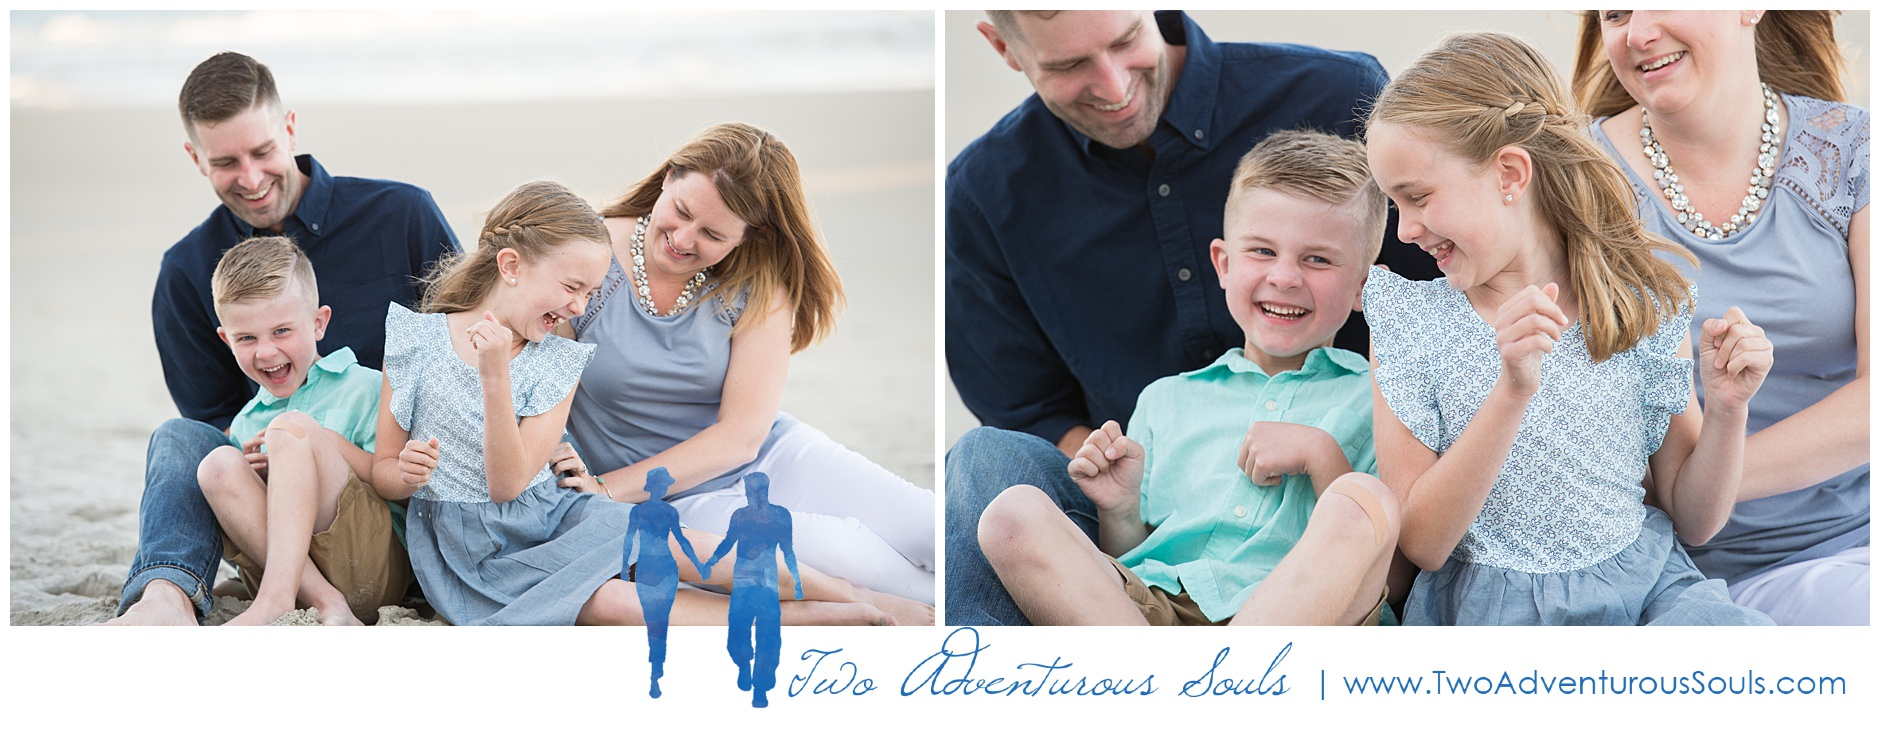 Maine Family Photographers, Ogunquit Beach Photographers, Two Adventurous Souls-AmyHFam_0002.jpg